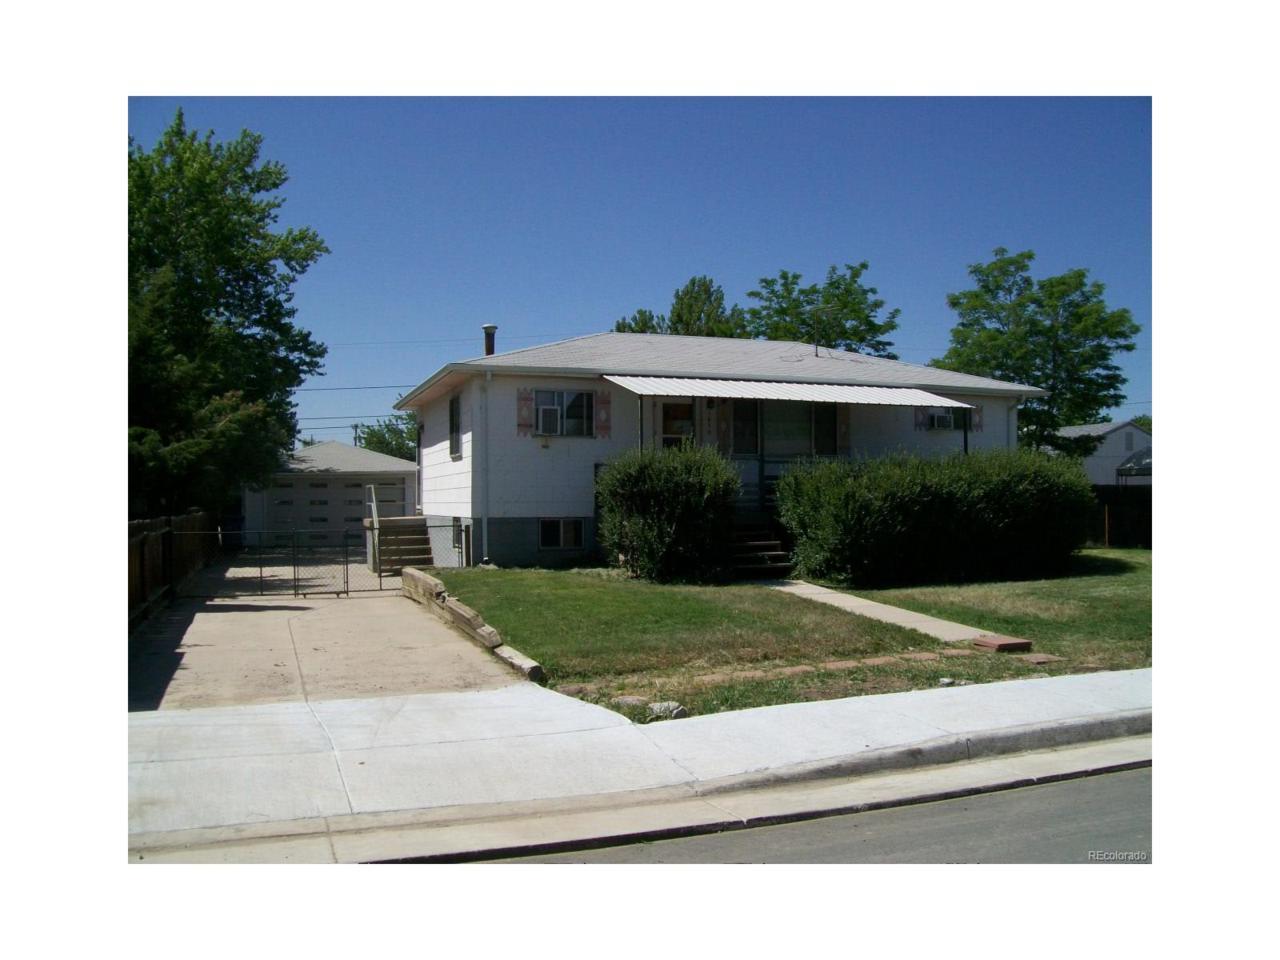 1850 W Girard Avenue, Englewood, CO 80110 (MLS #8403391) :: 8z Real Estate